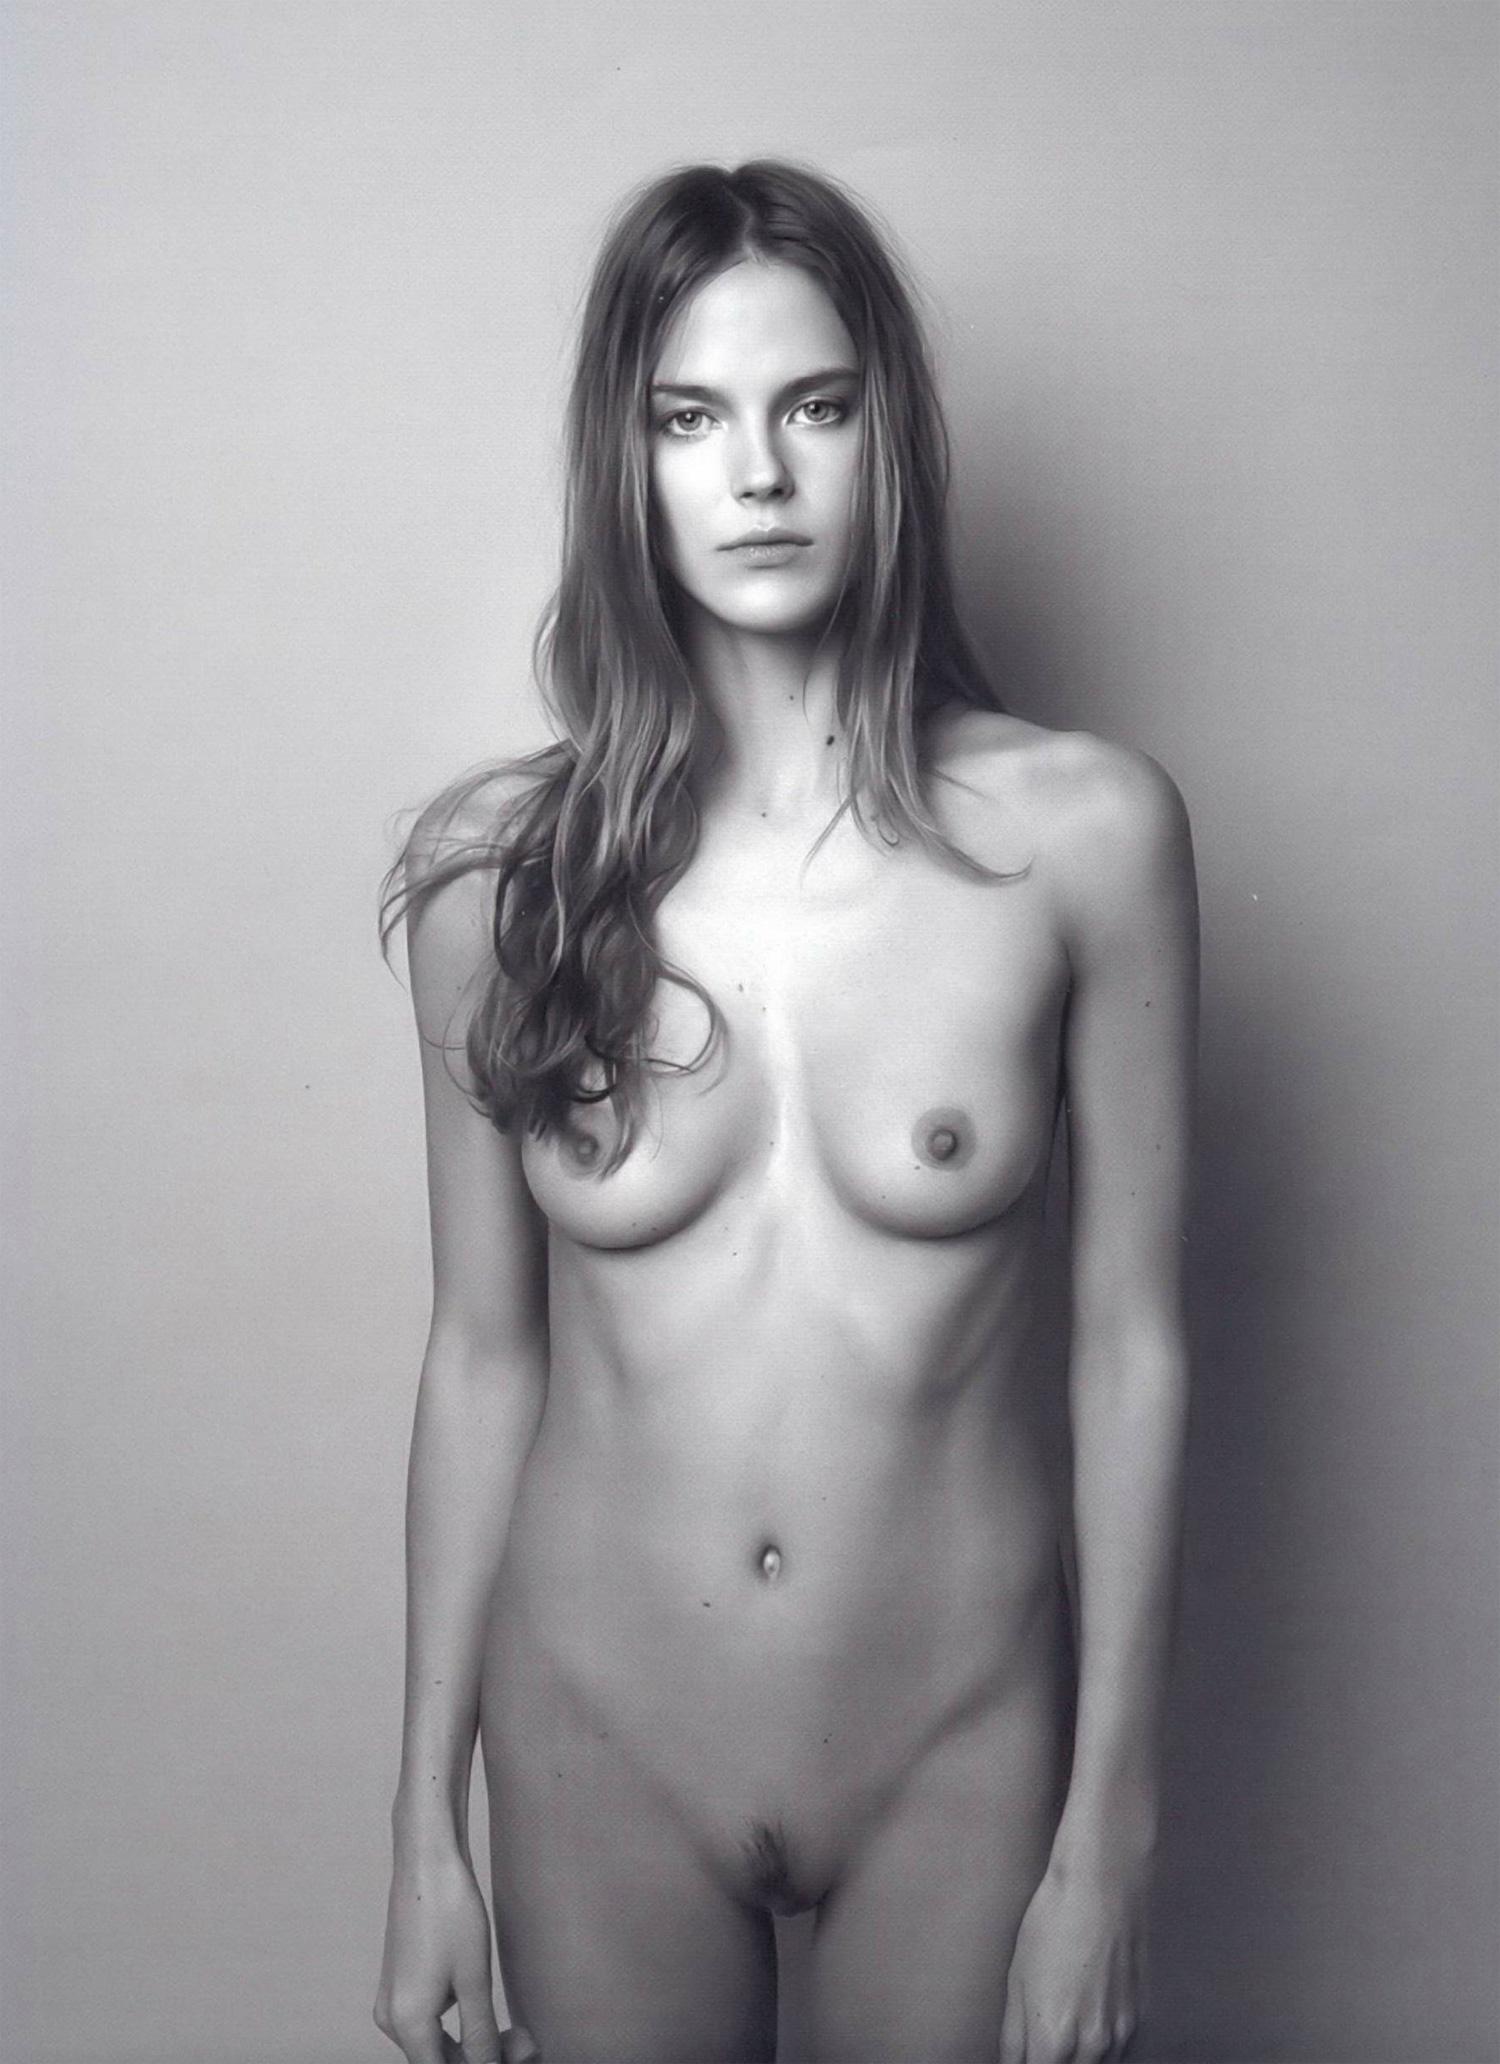 Jumior model nudes hentai pornstars